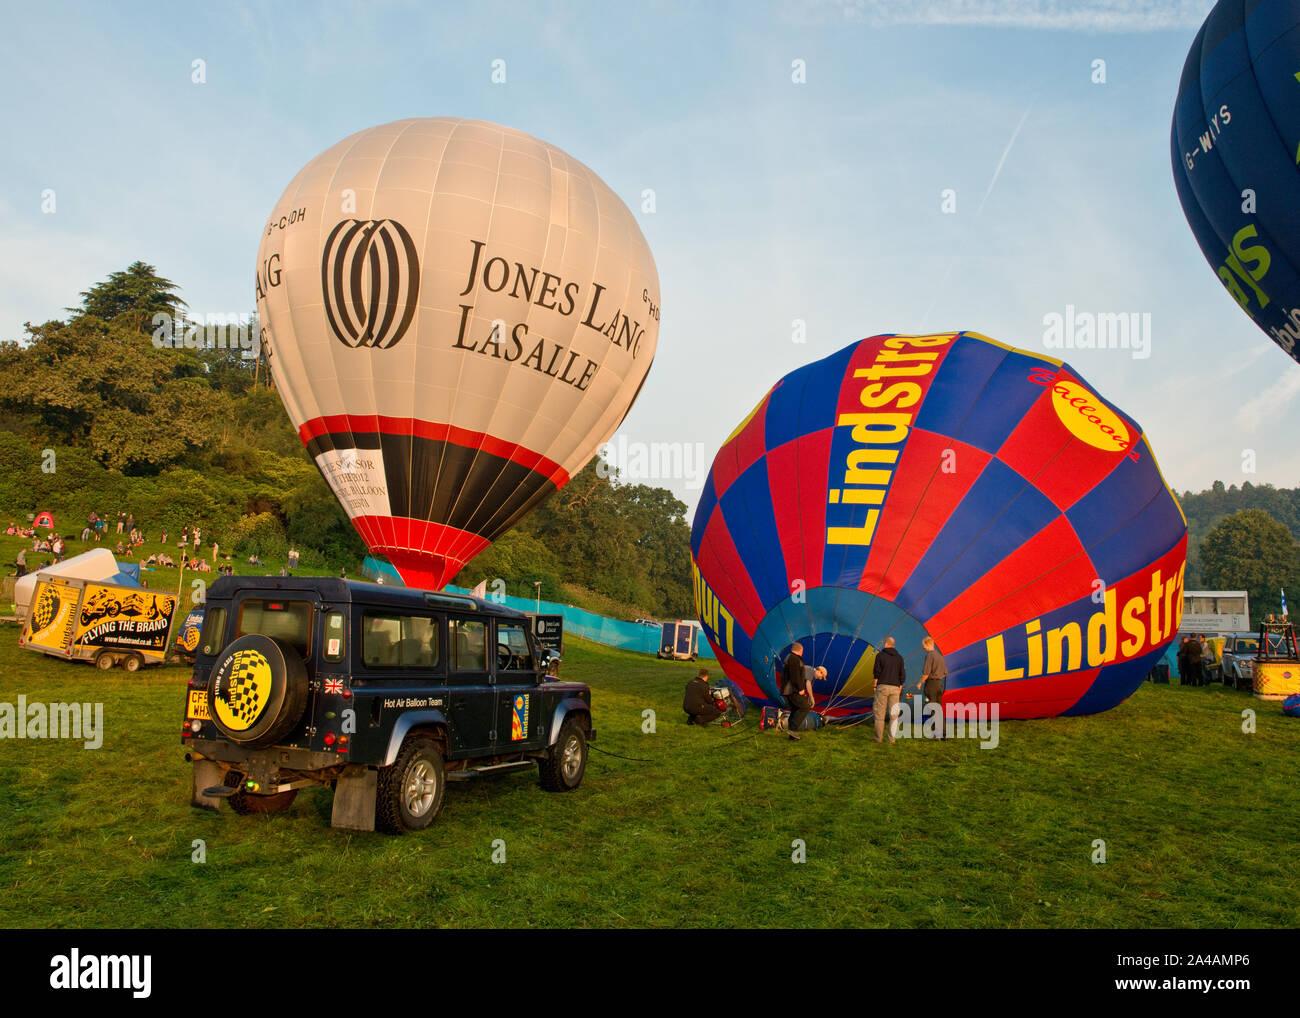 Lindstrand hot air balloon being inflated. Bristol International Balloon Fiesta, England Stock Photo